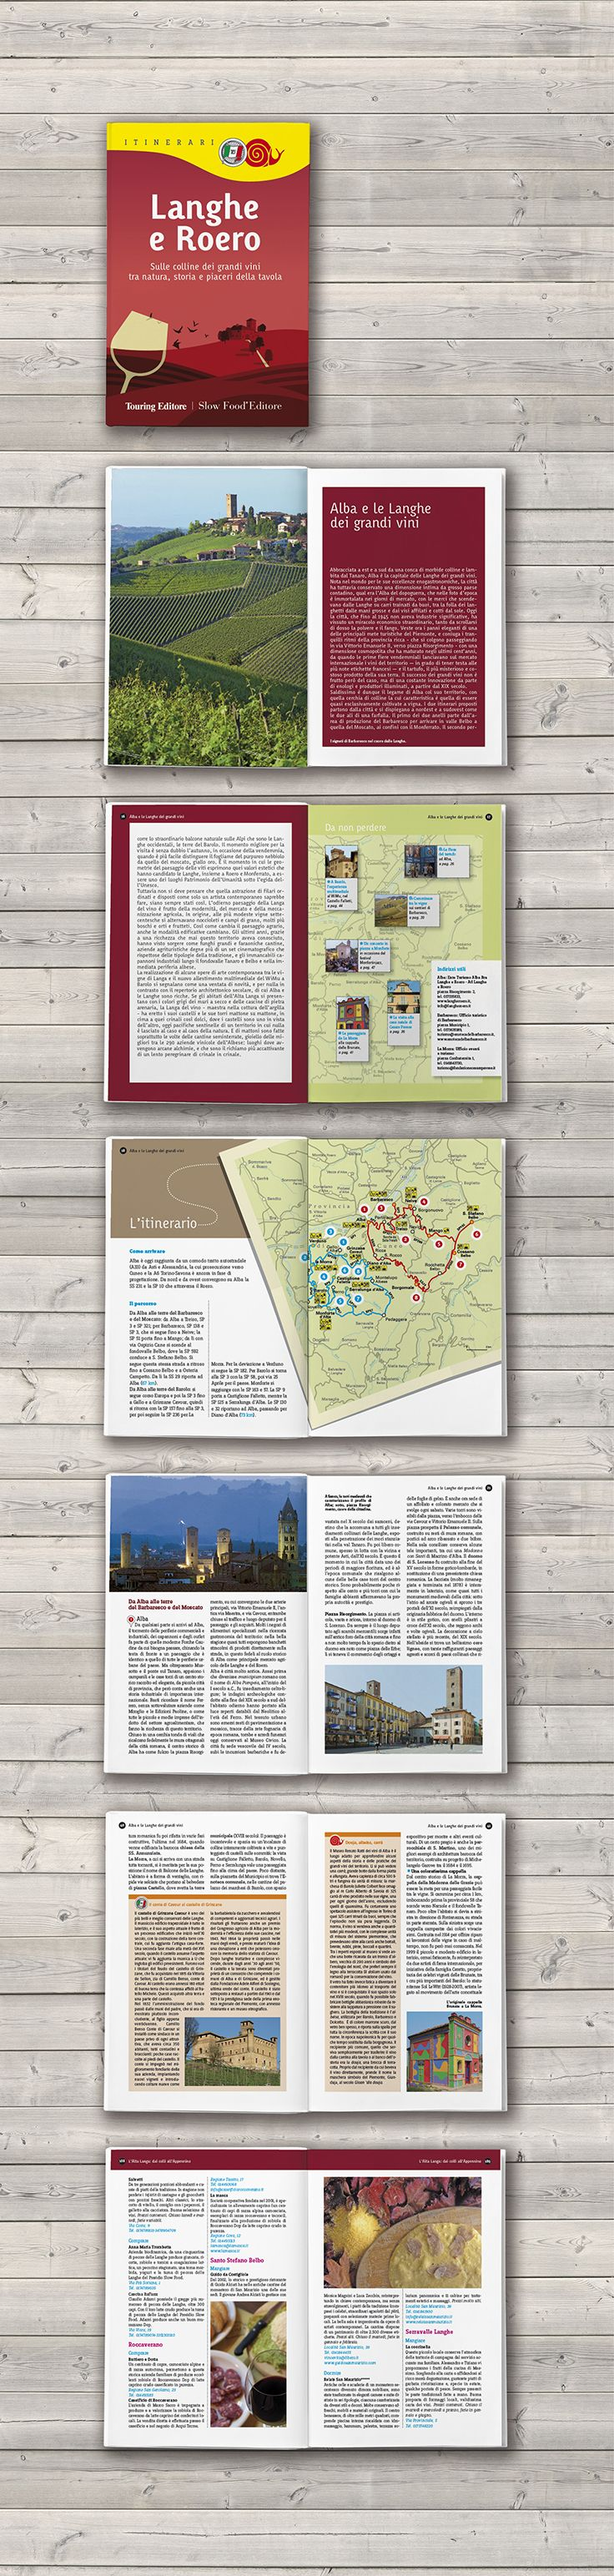 Cover and book design / Tourist guide / Touring Editore - SlowFood Editore